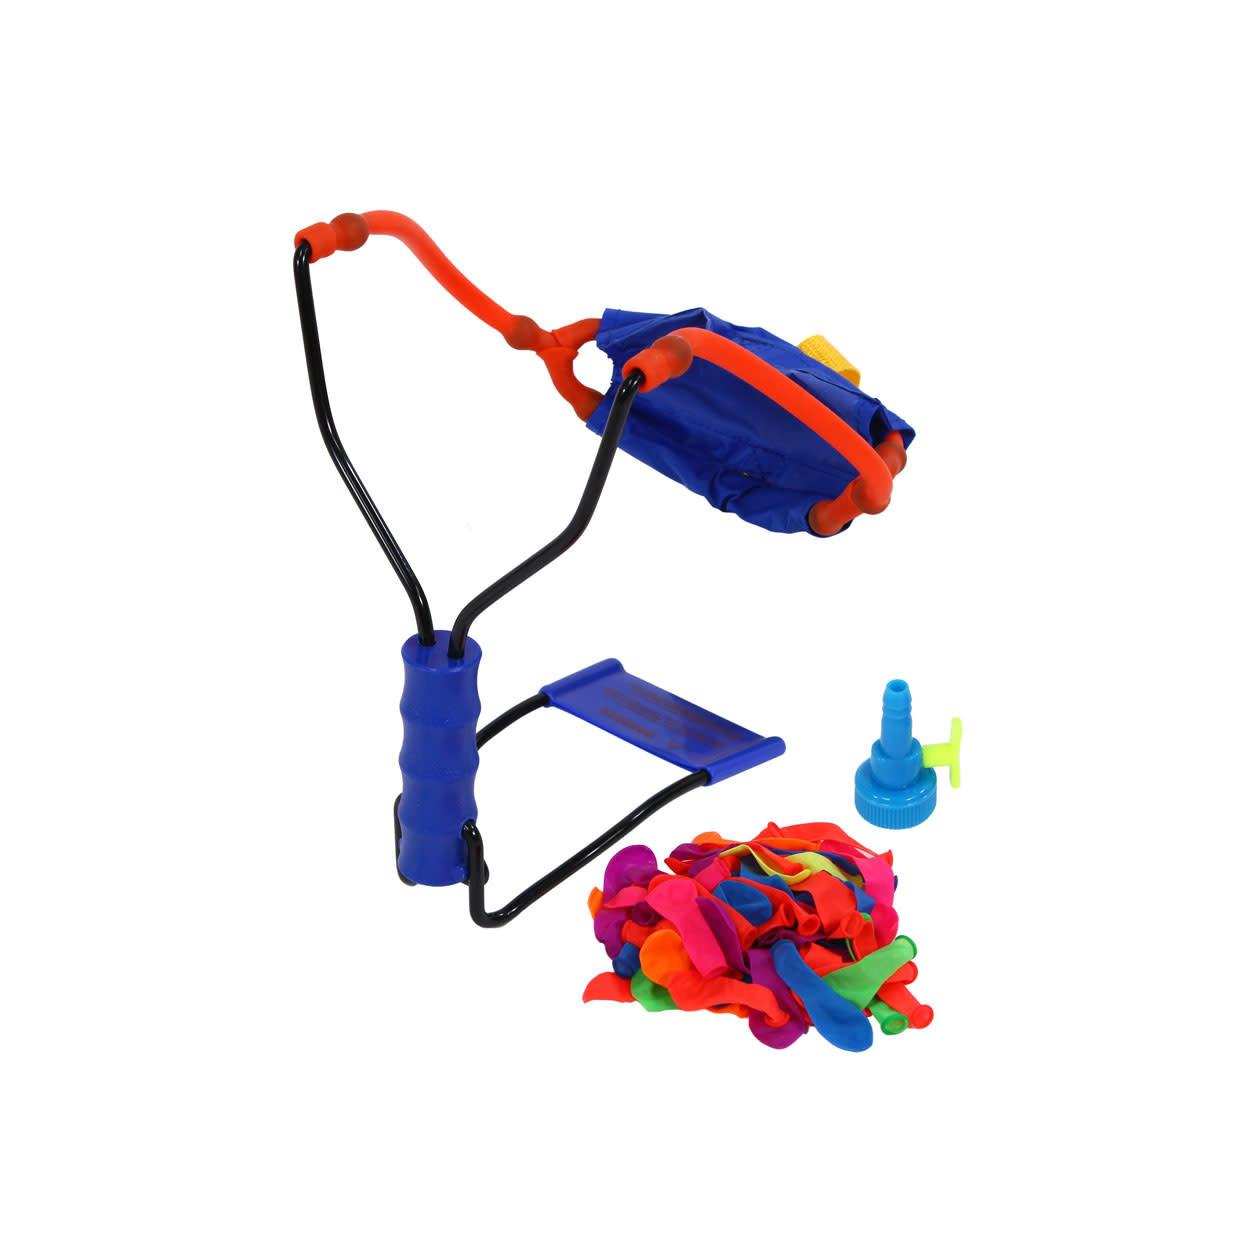 Wrist Water Balloon  Launcher-1